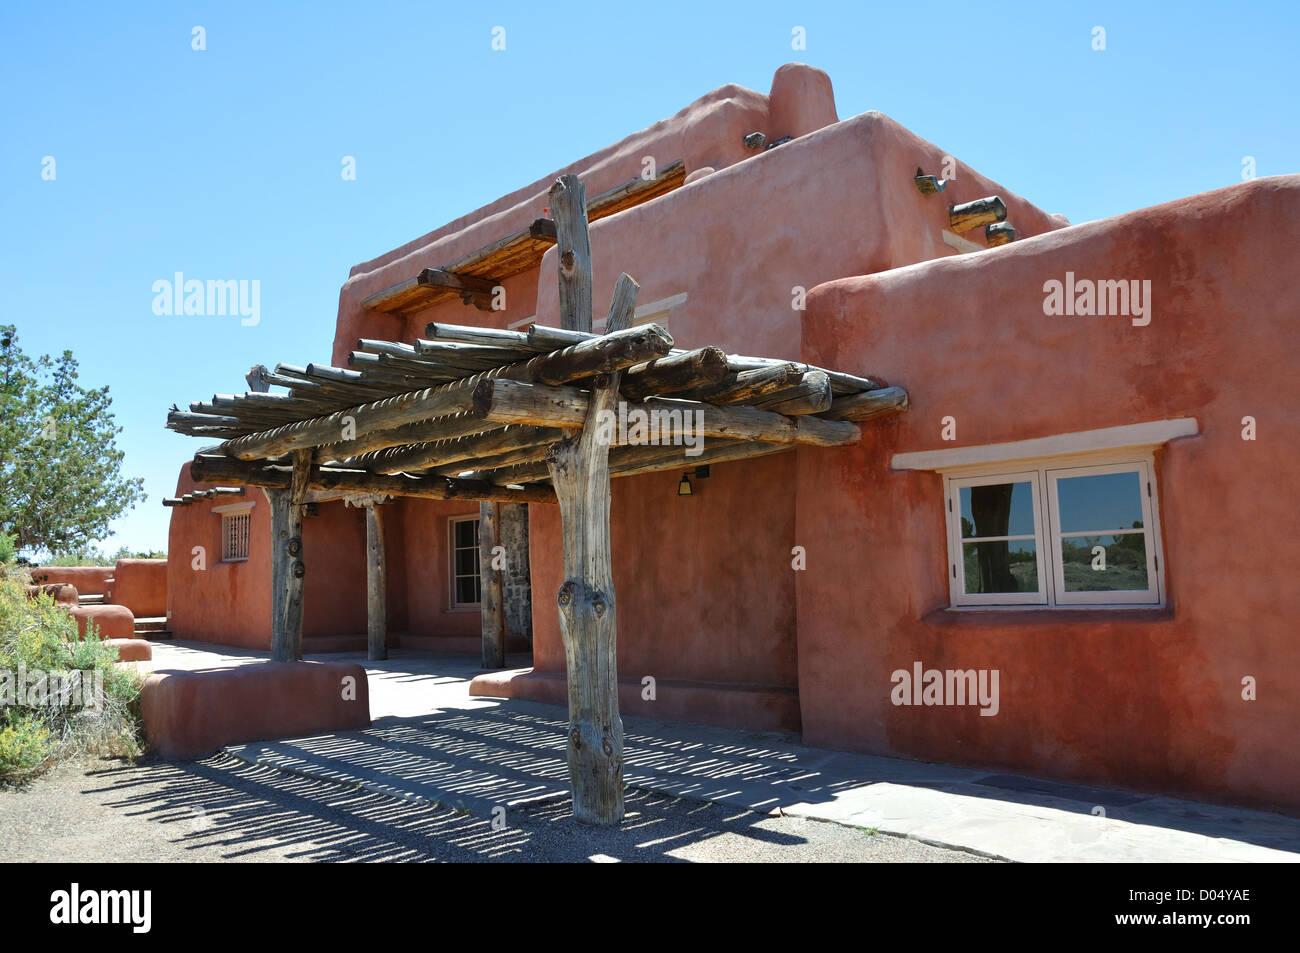 Adobe Stil Haus Arizona Usa Stockfoto Bild 51740374 Alamy